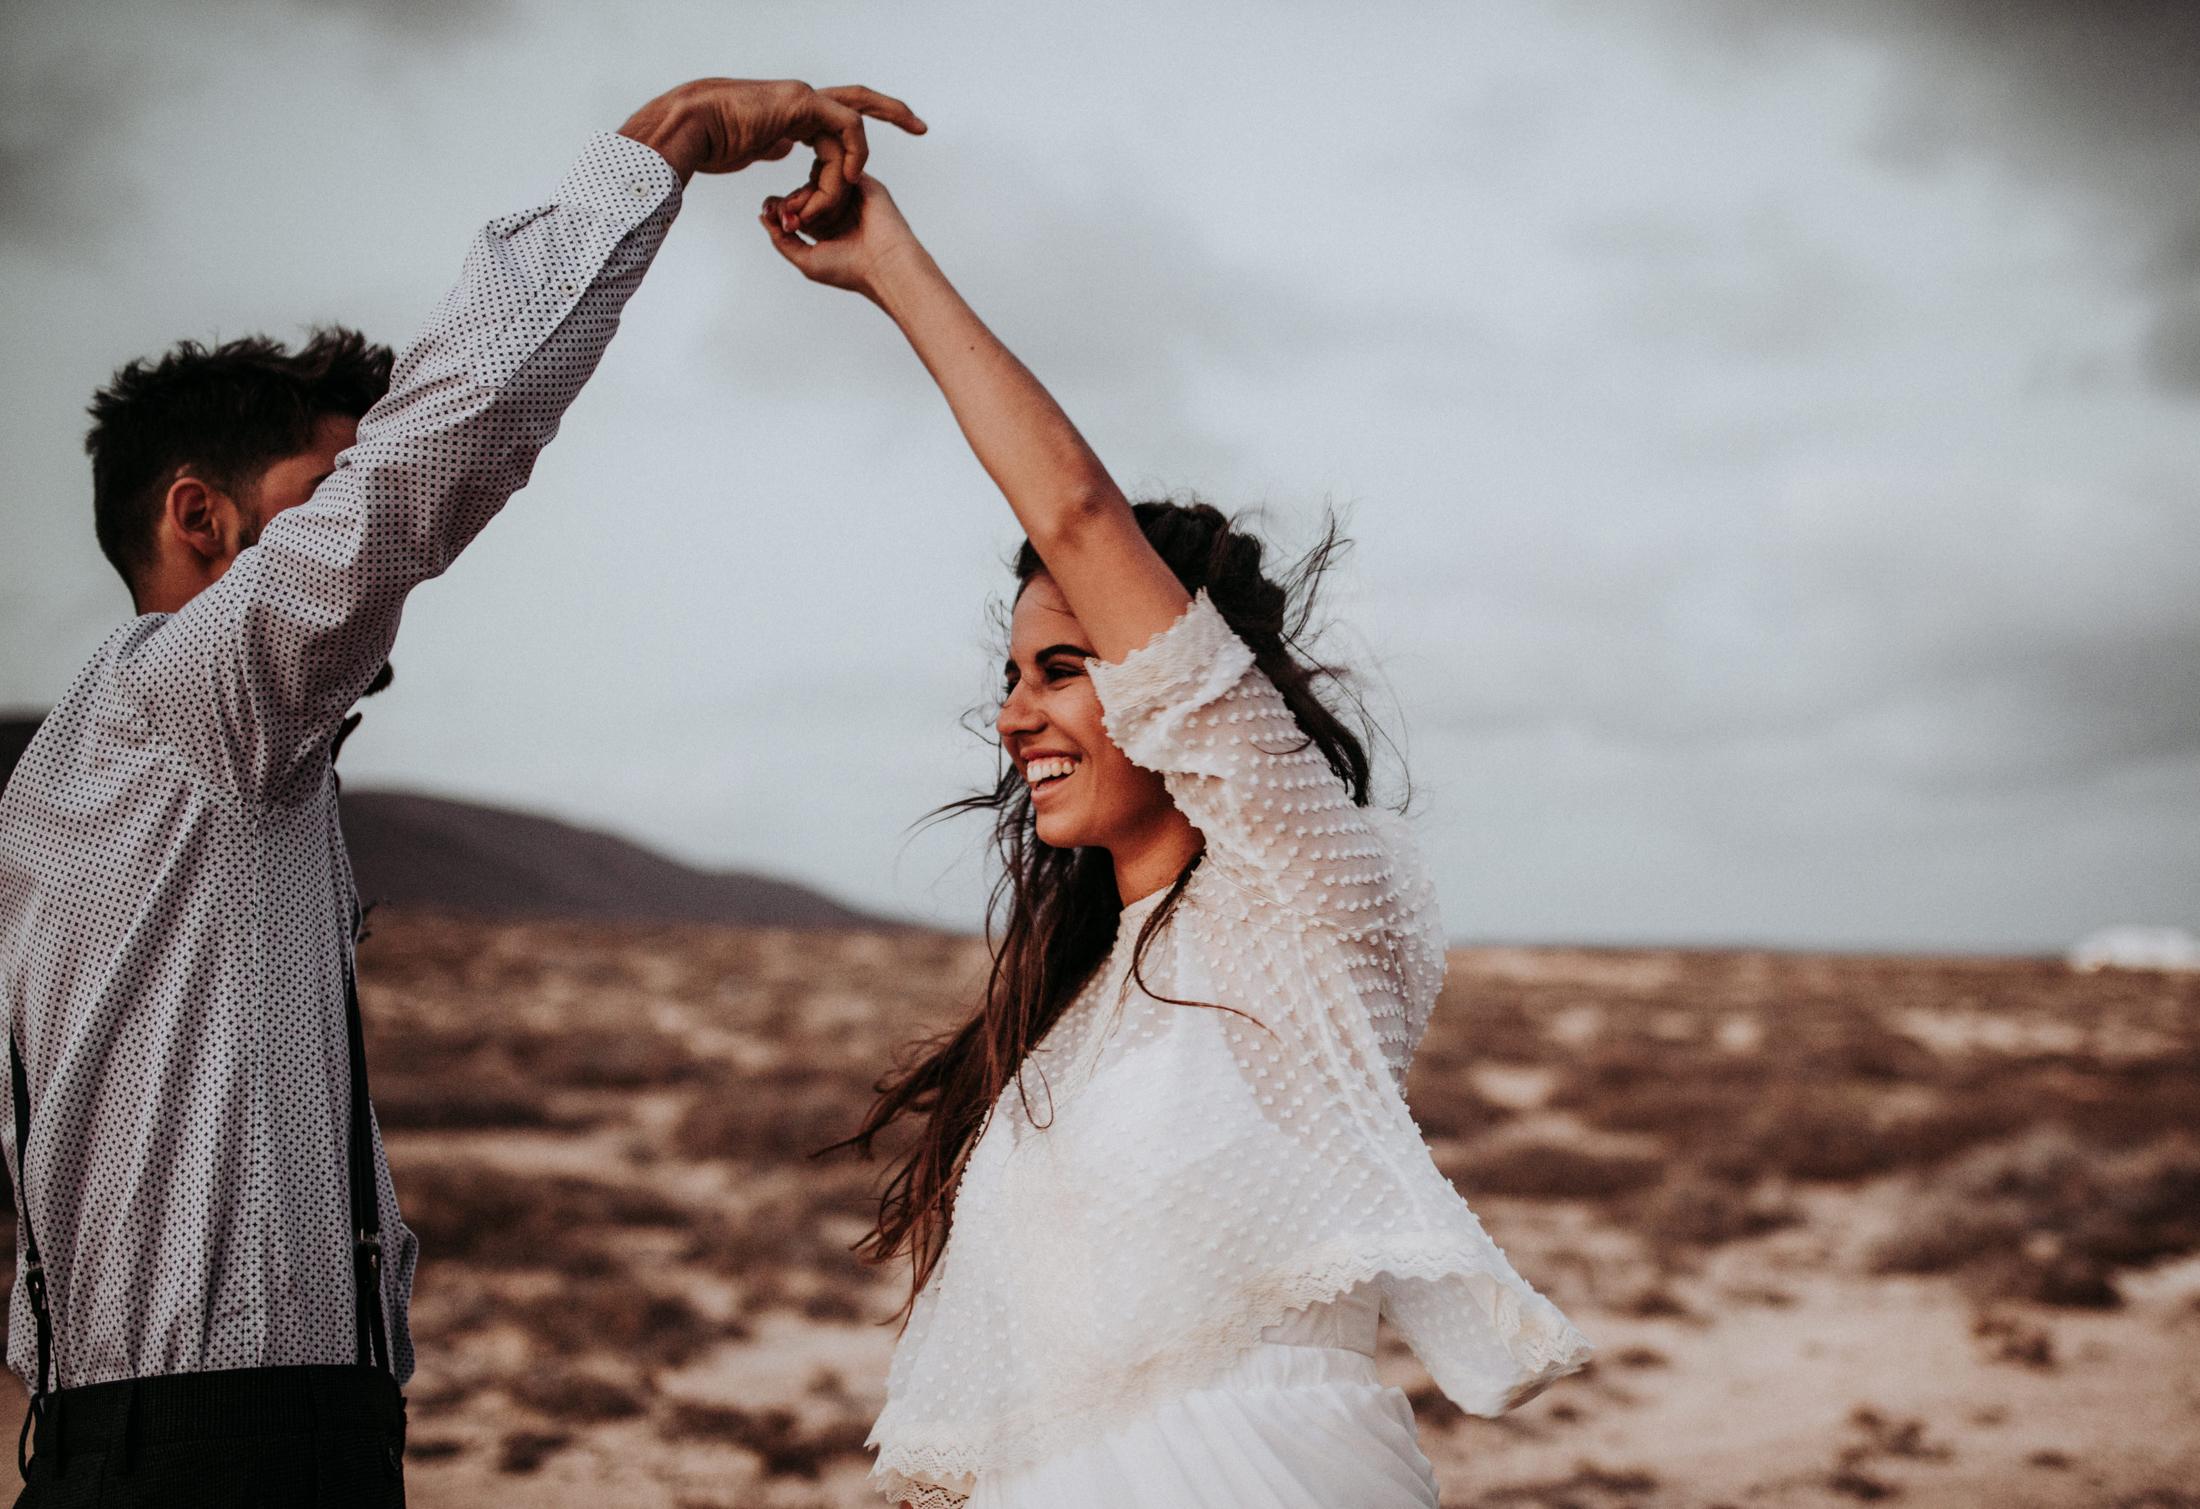 Wedding_Photographer_Mallorca_Daniela-Marquardt_Photography_CanaryIslands_Lanzarote_Iceland_Tuskany_Santorini_Portugal_Schweiz_Austria_Bayern_Elopement_Hochzeitsfotograf_41